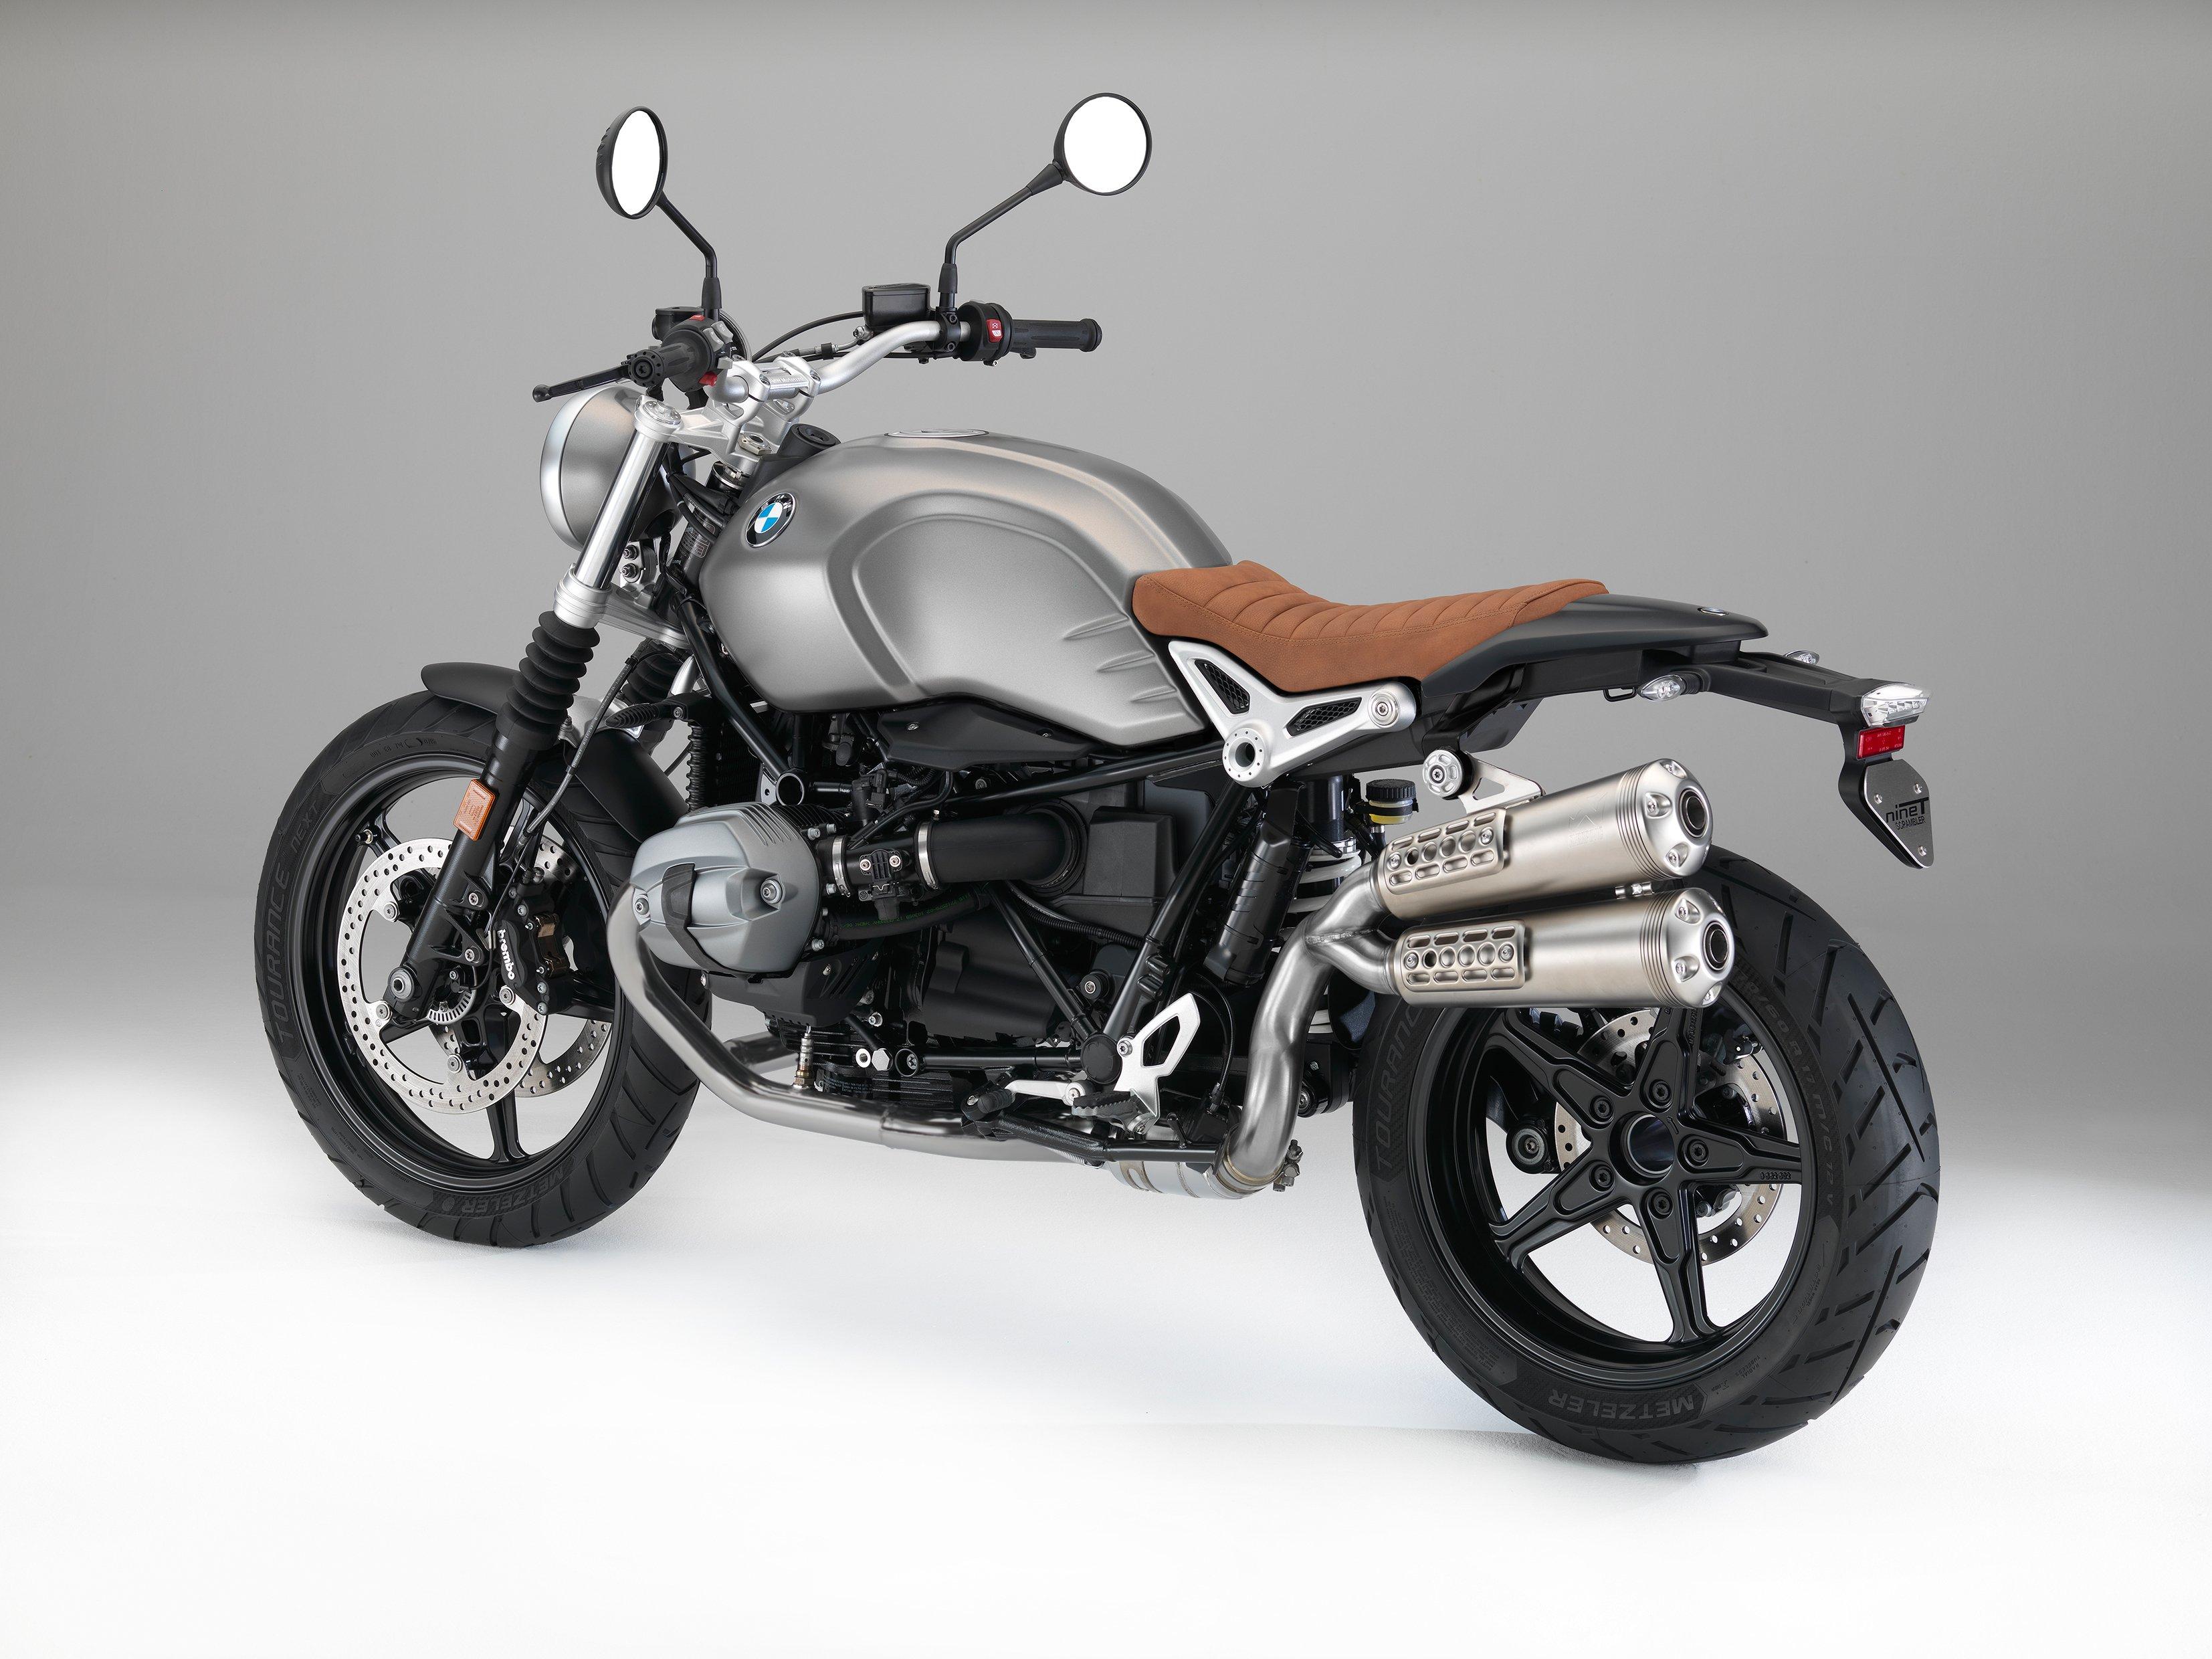 BMW R NineT Scrambler An Iconic Bike Recreated Image 408915